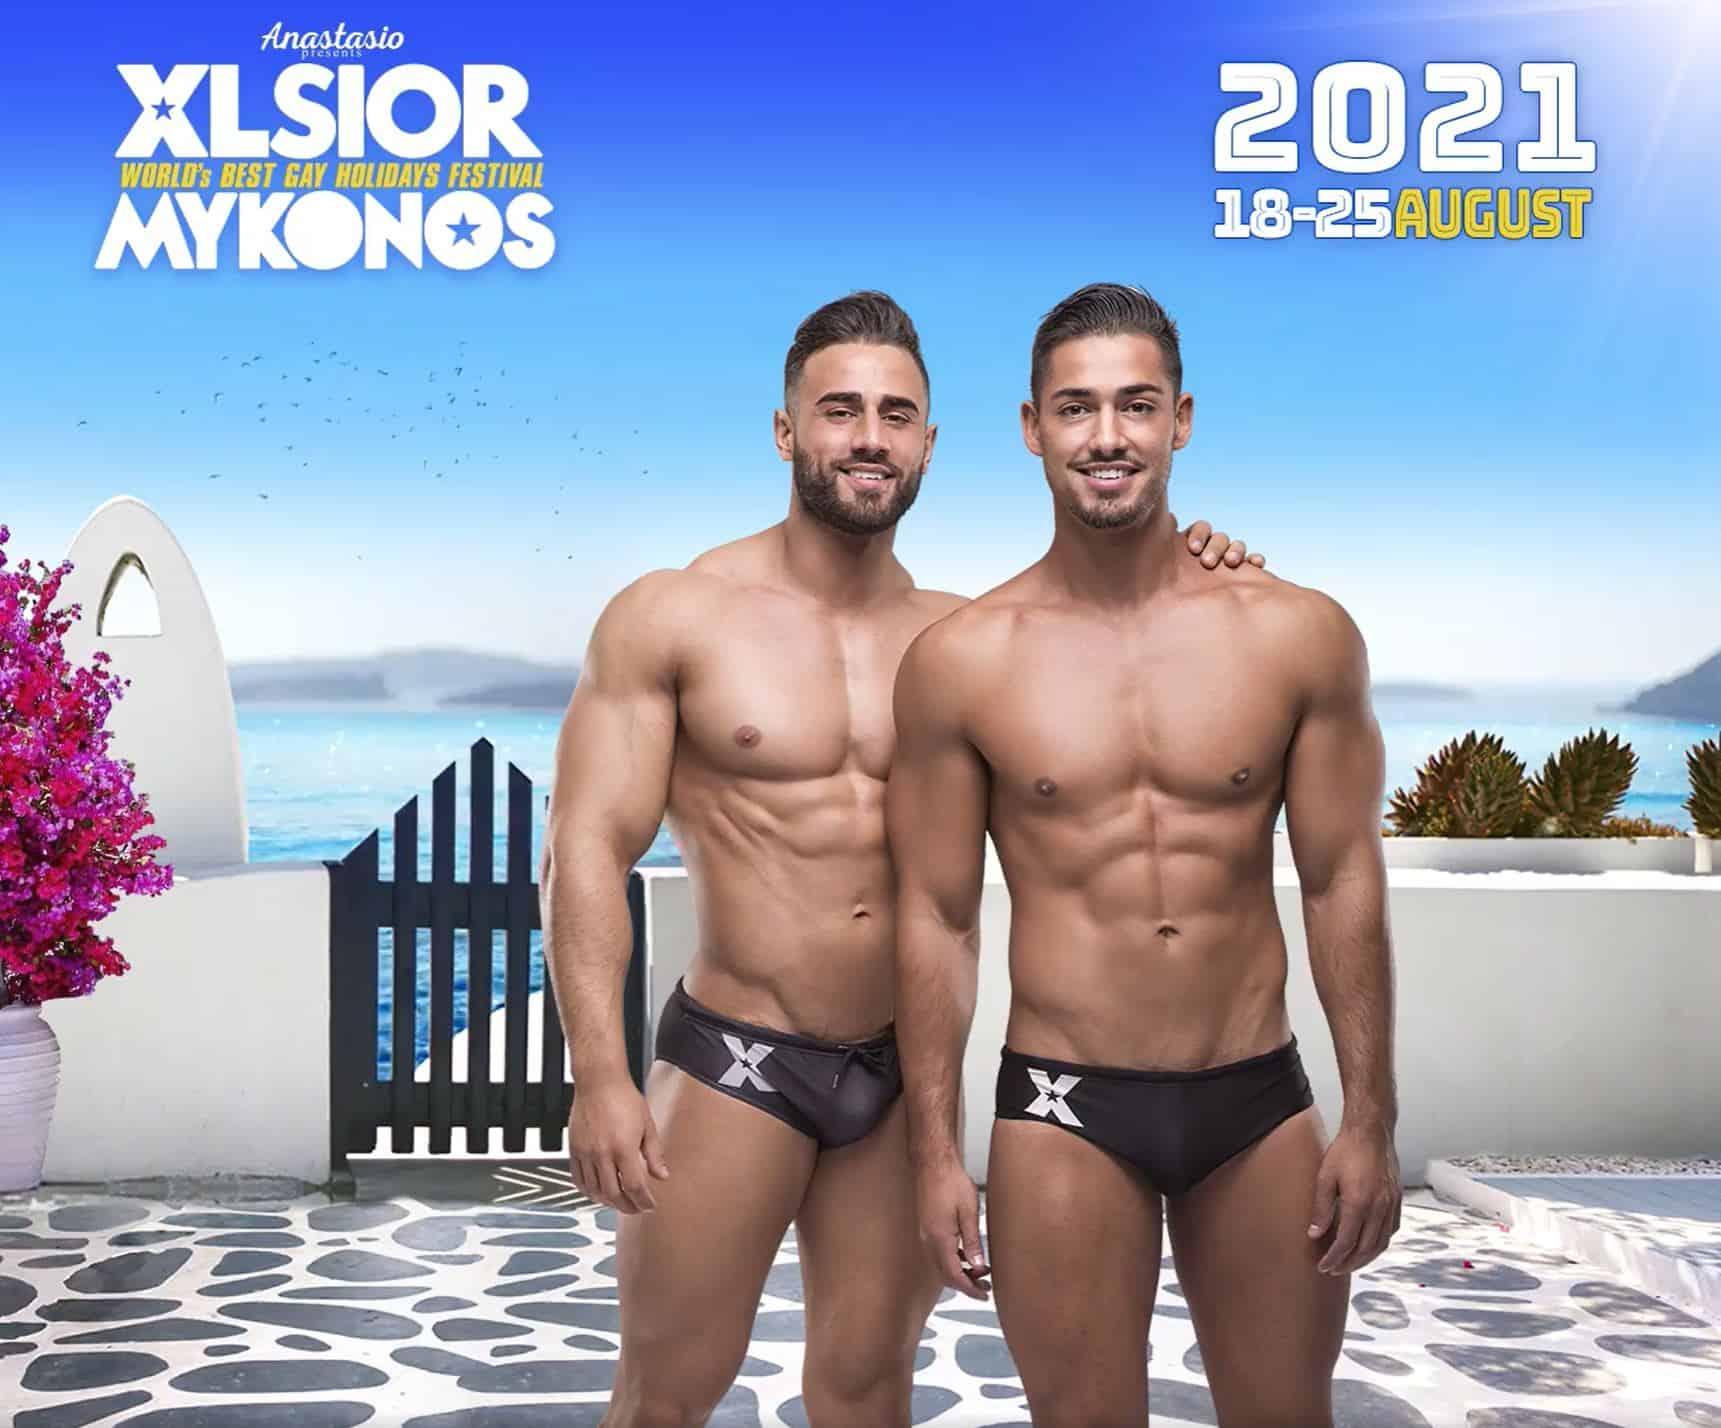 XLSIOR Mykonos 2021